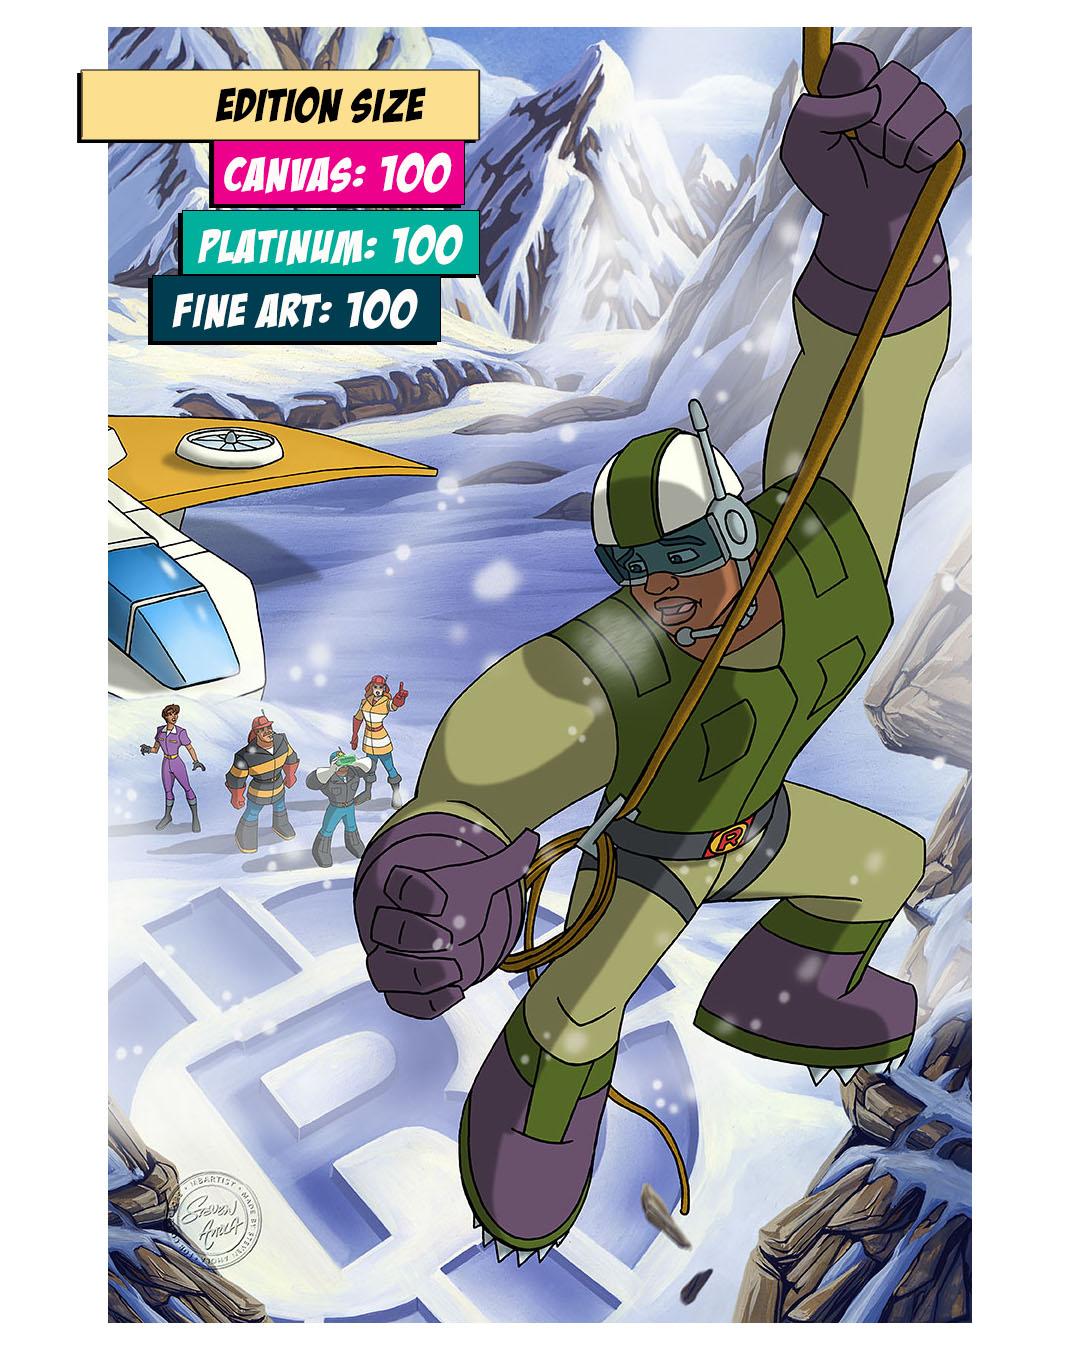 RESCUE HEROES: S1:E01